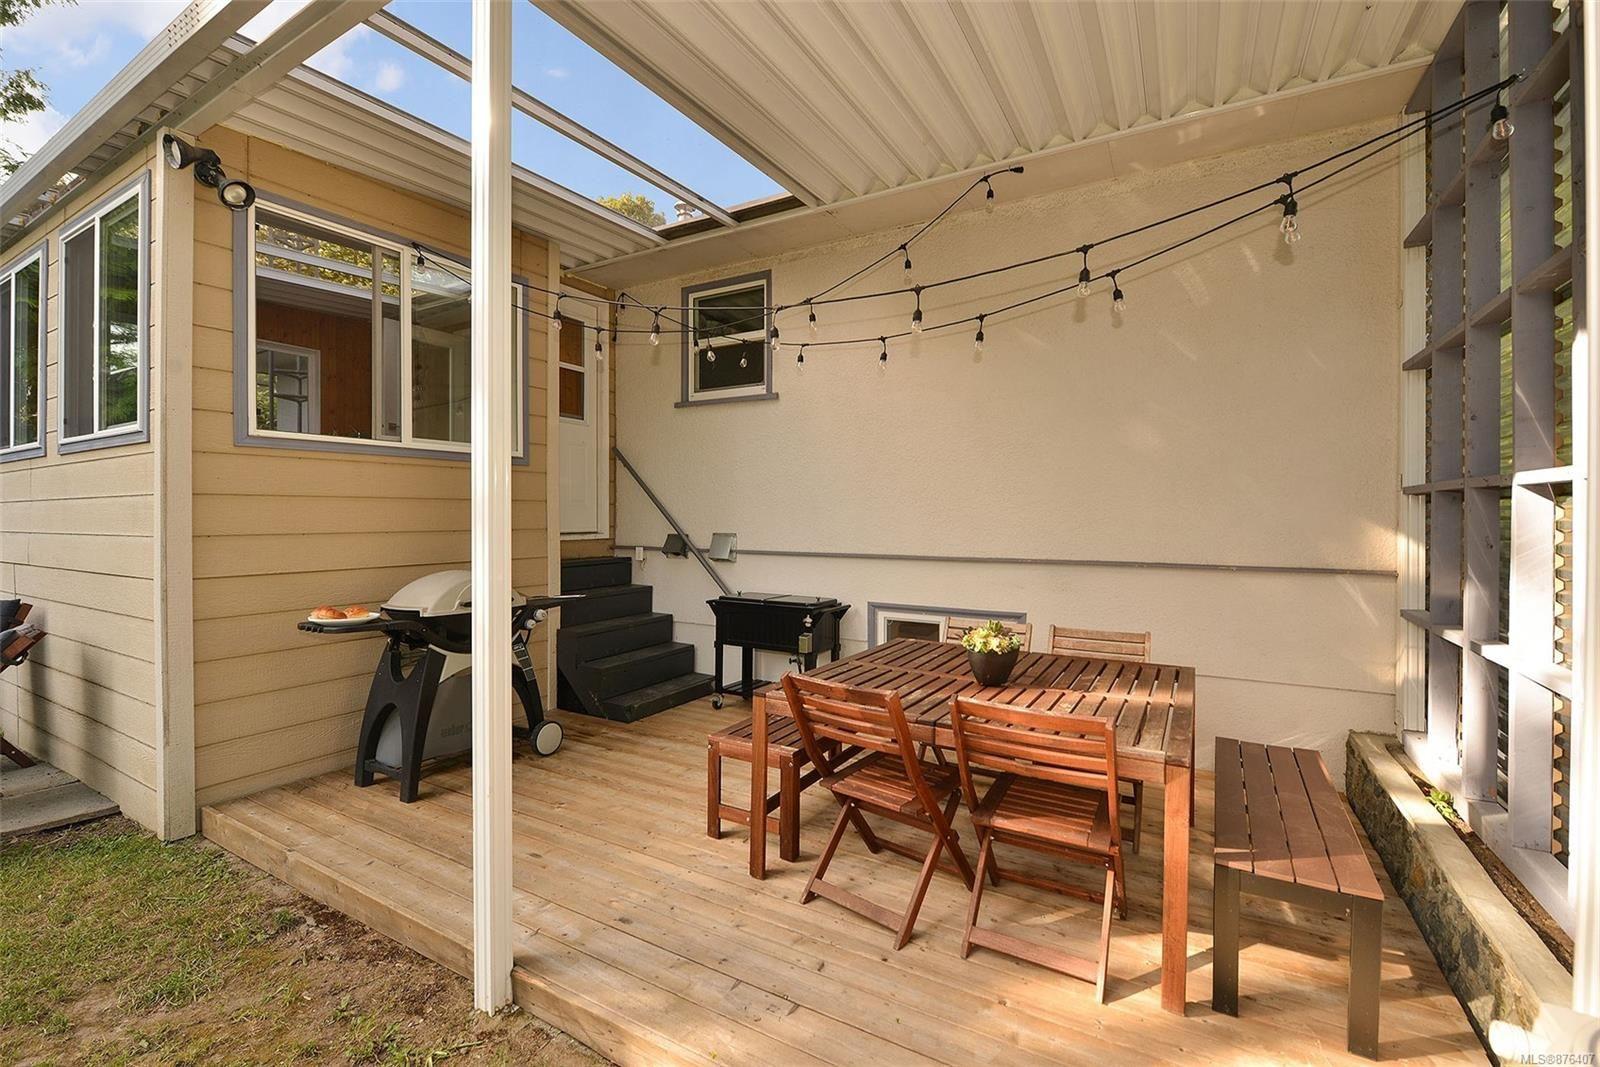 Photo 4: Photos: 631 Cowper St in Saanich: SW Gorge House for sale (Saanich West)  : MLS®# 876407